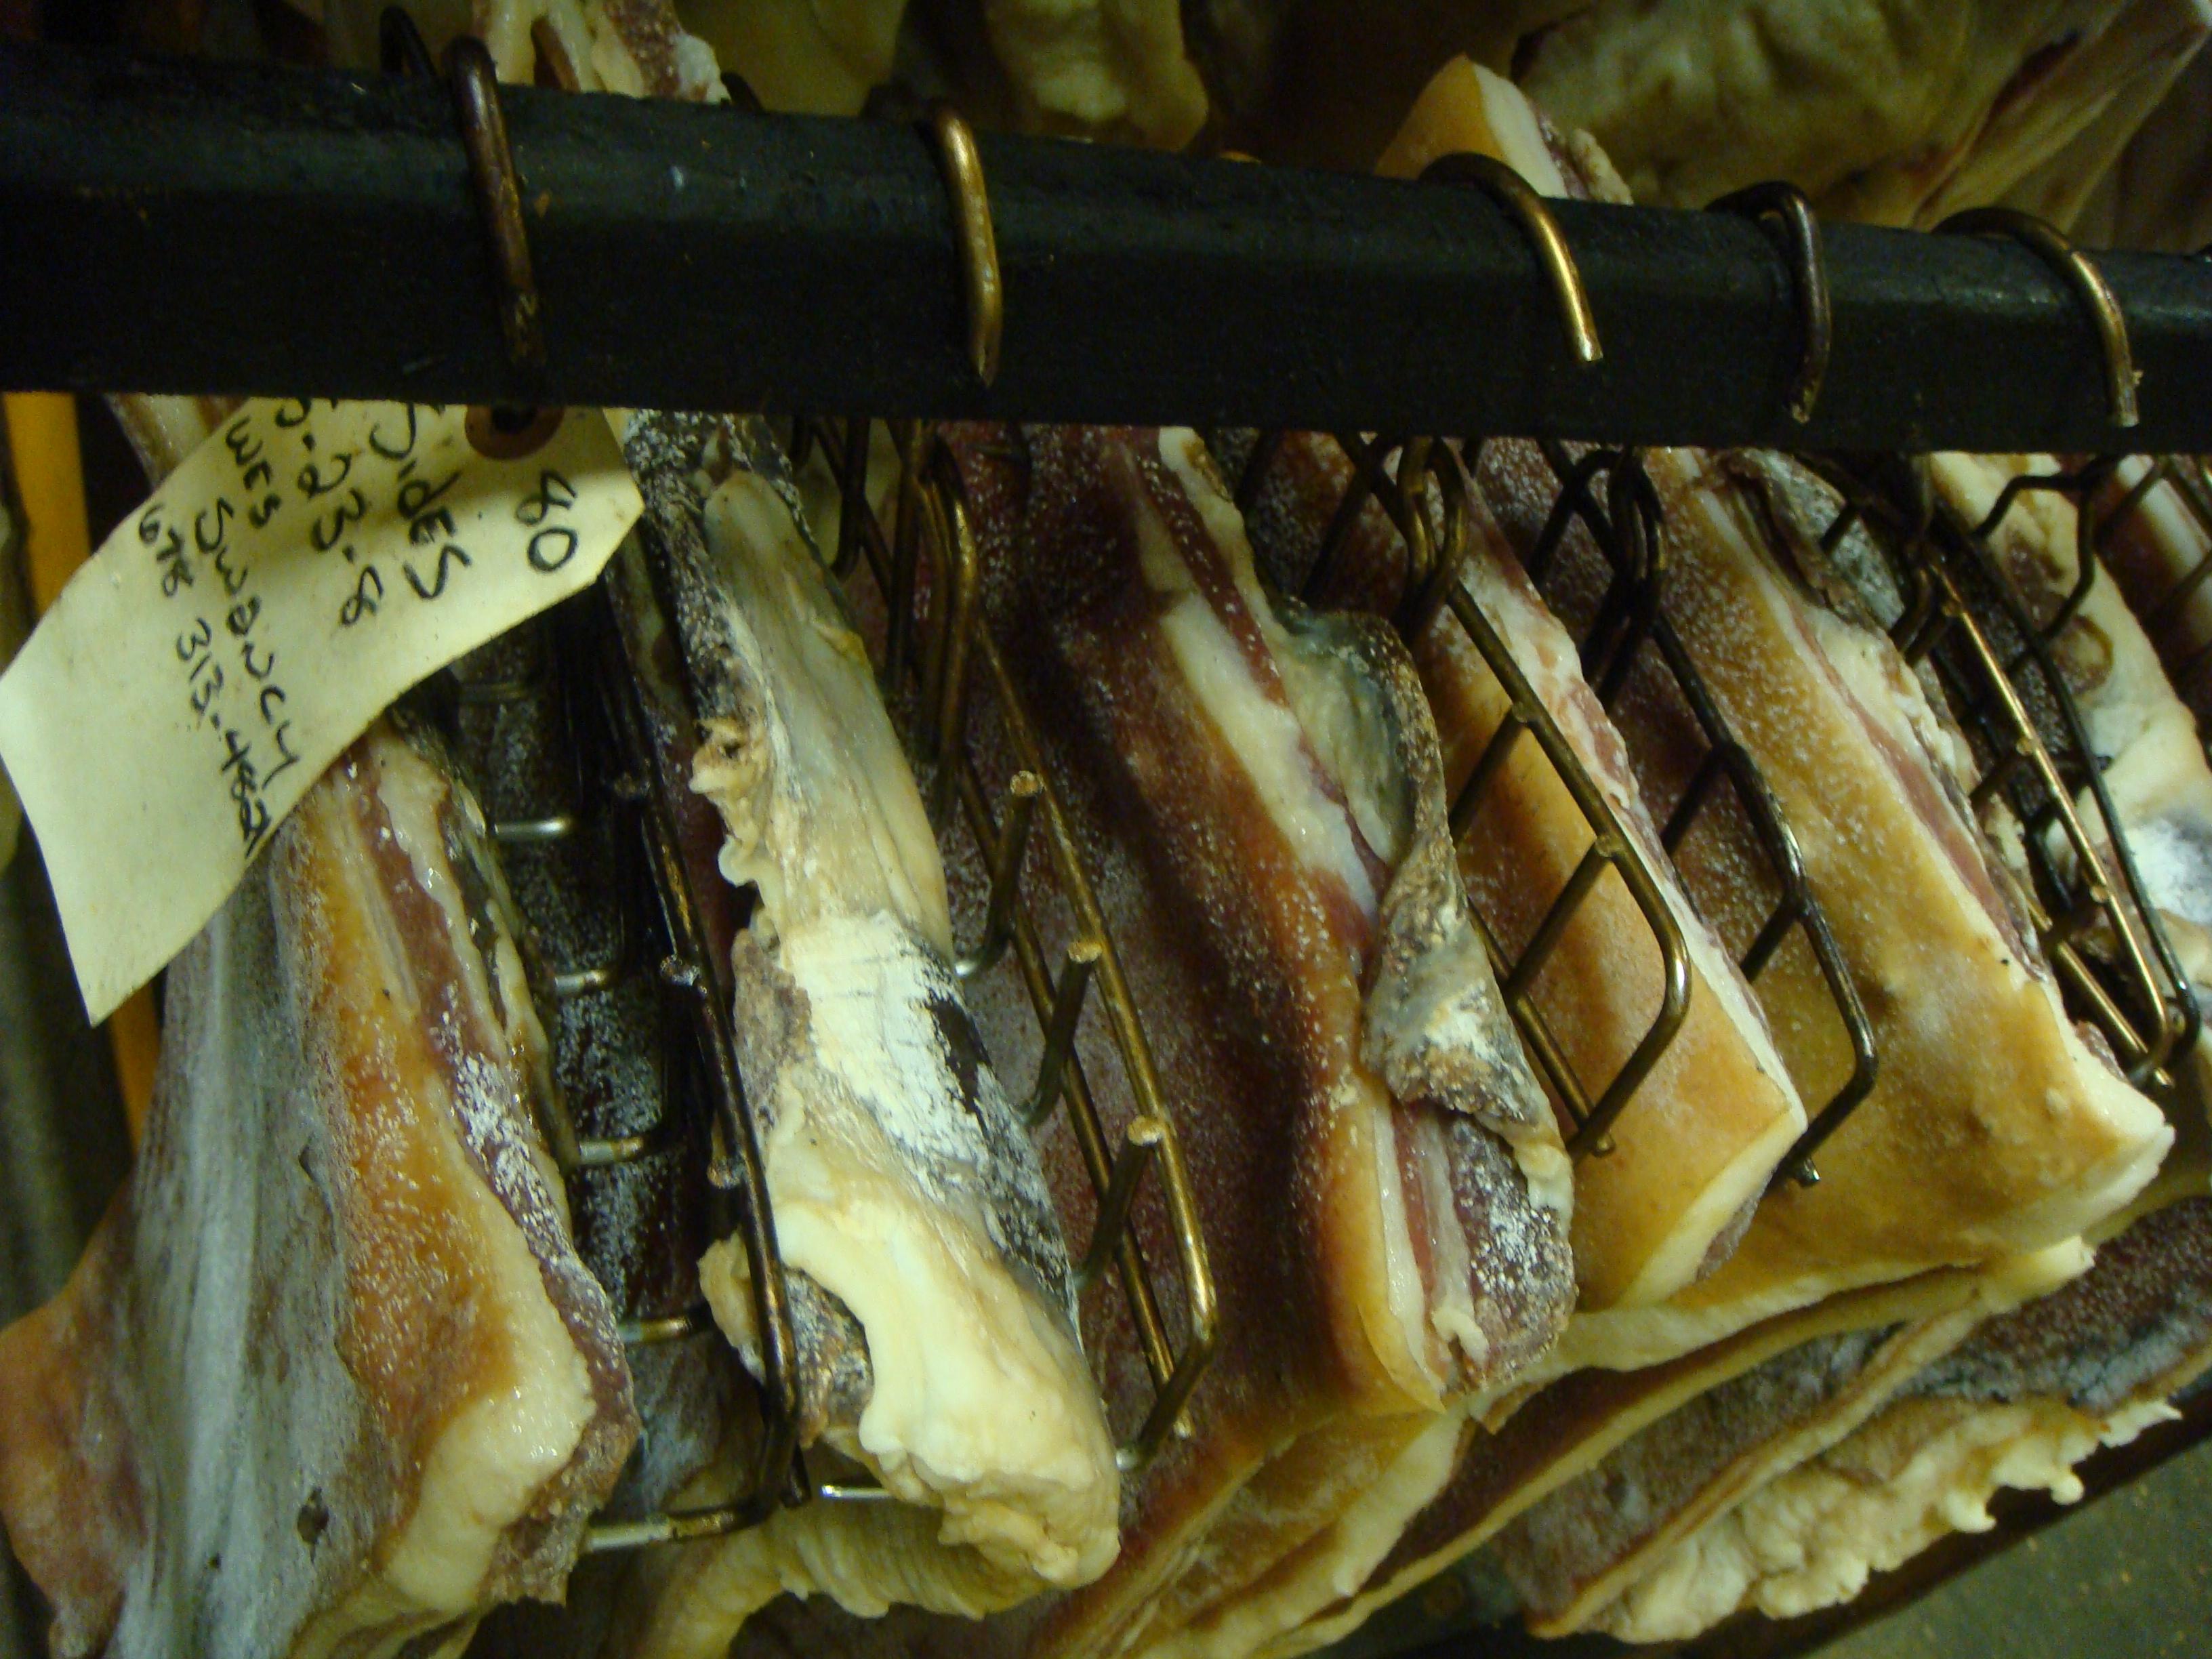 Heirloom Tomato Sandwiches Country Living Bentons Hams